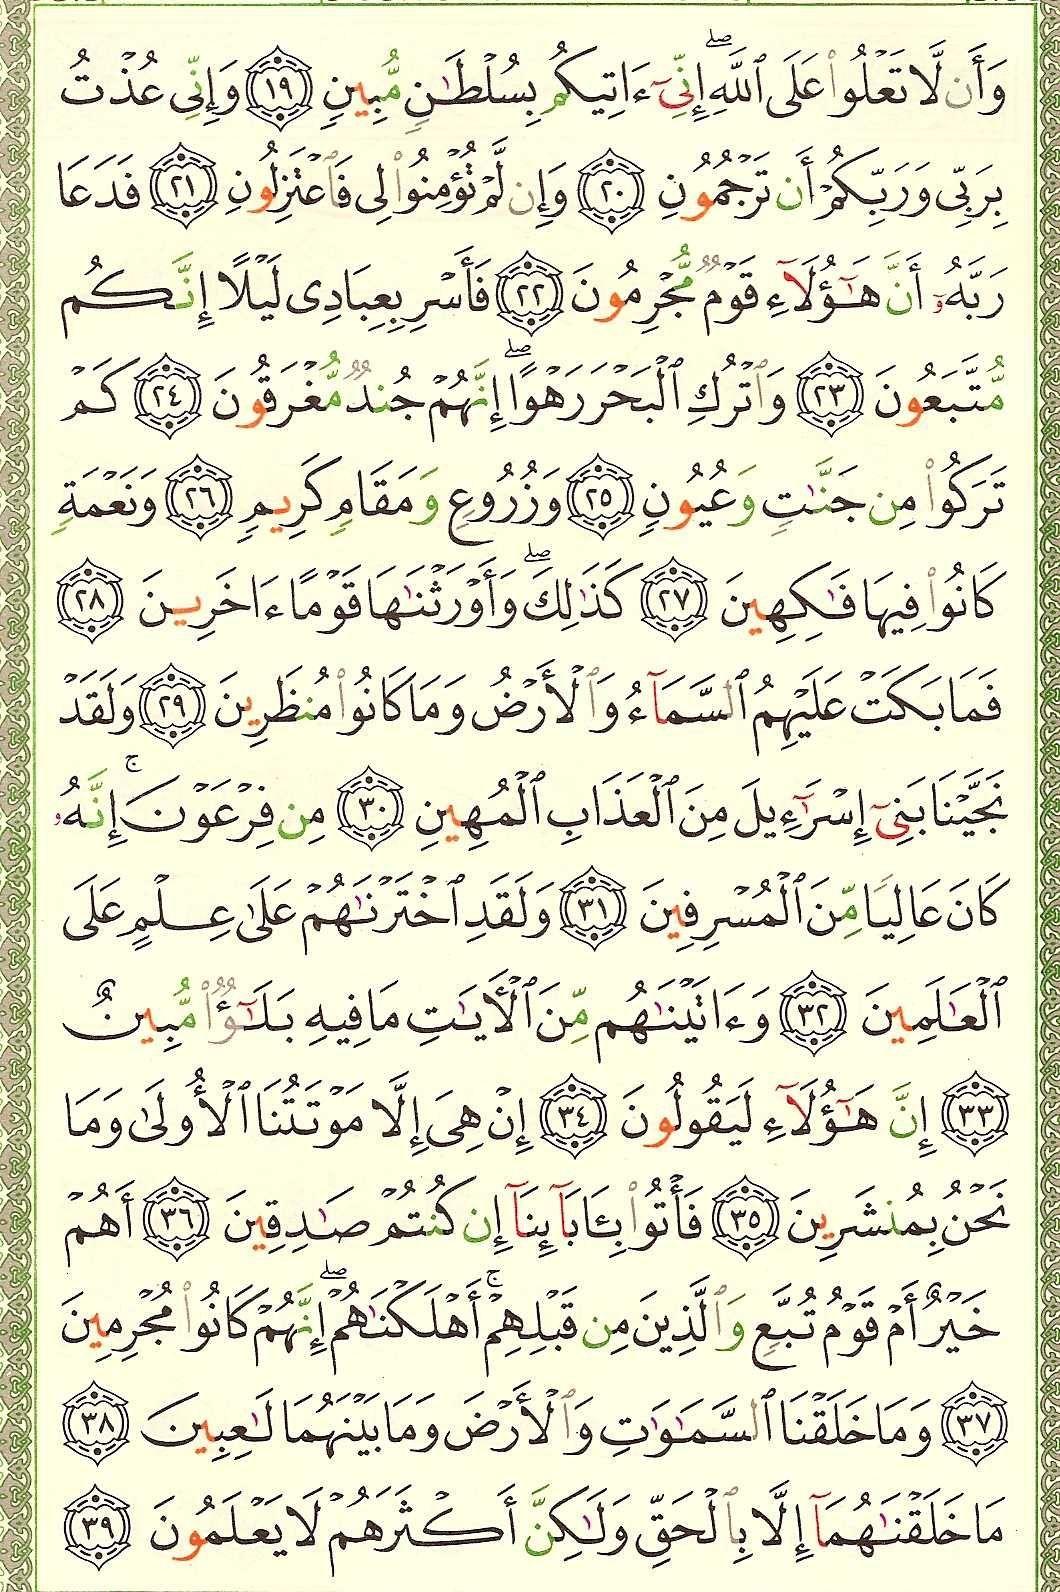 Read Quran In Uthmani Script Online Quran Quran Verses Reading